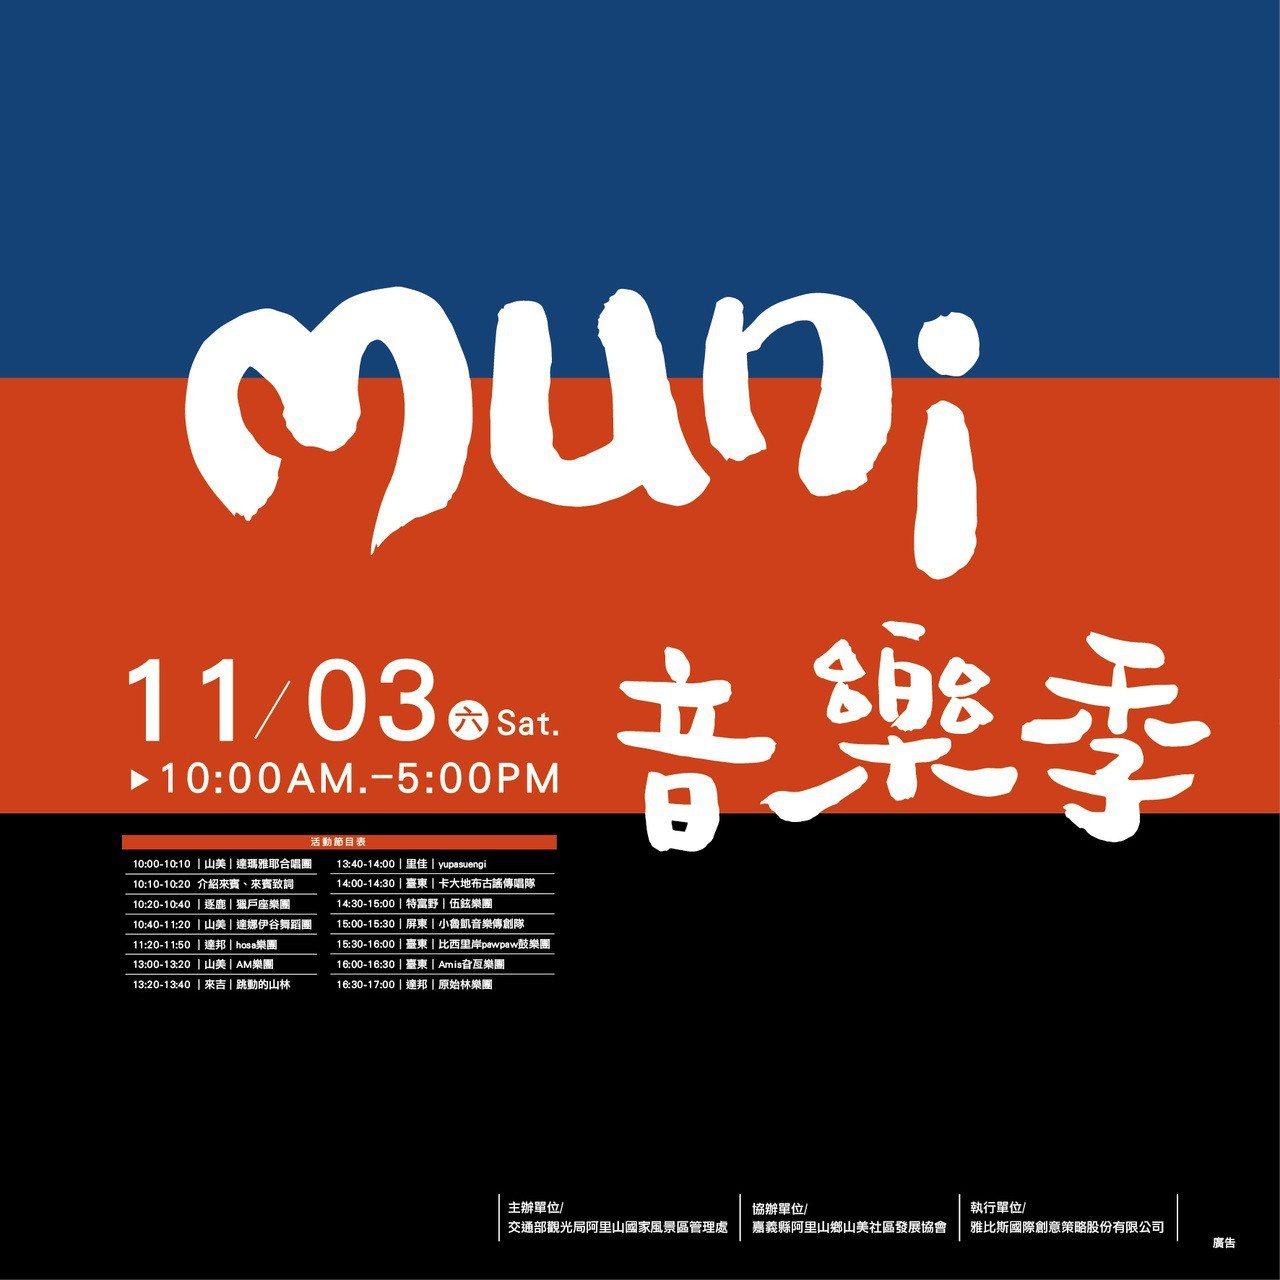 muni音樂季11/3在阿里山鄉山美達娜伊谷開唱。圖/阿里山國家風景區管理處提供